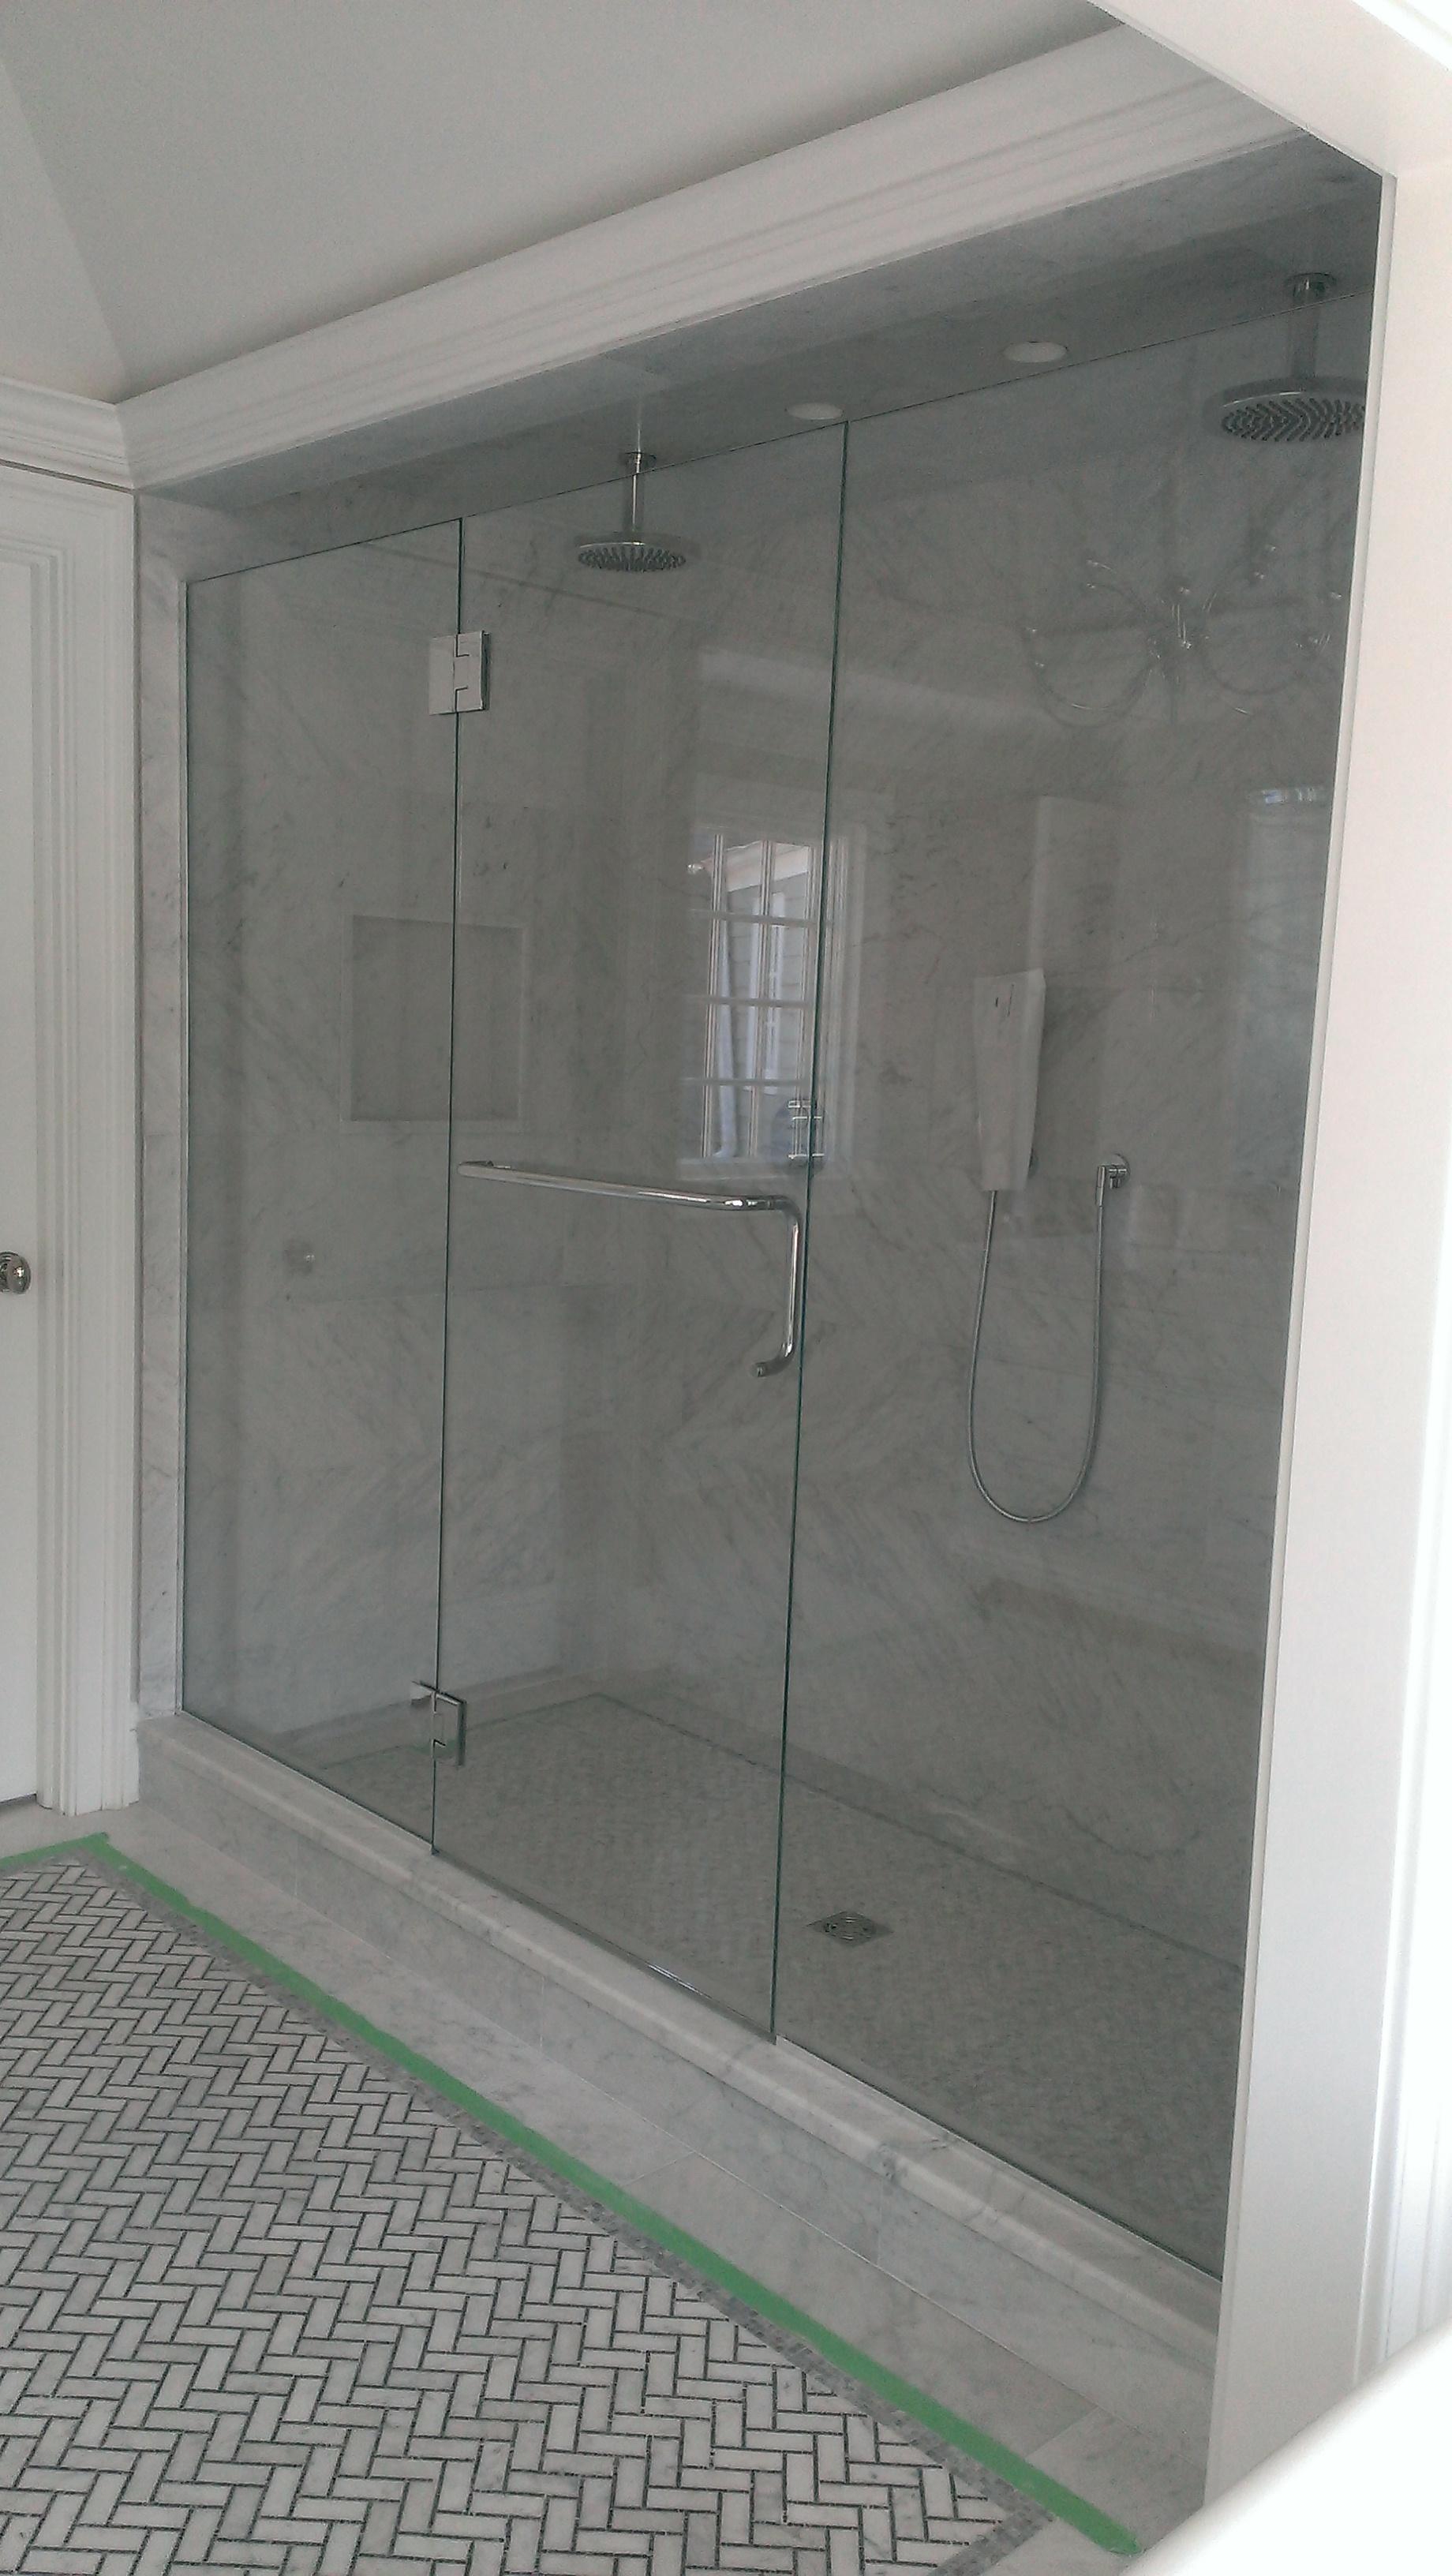 panel door panel with channel